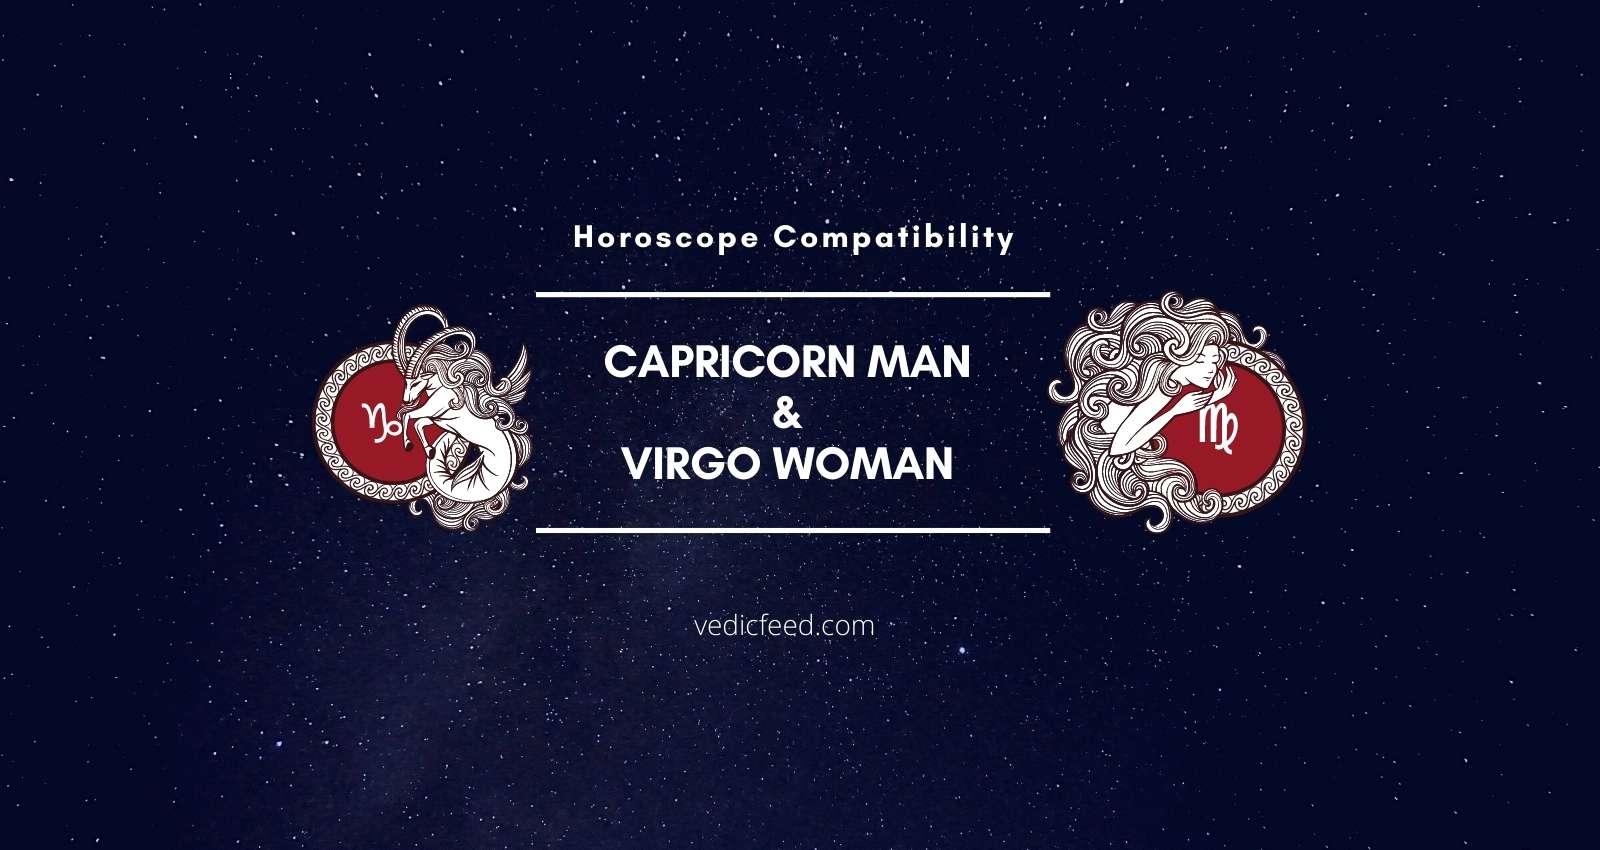 Capricorn Man and Virgo Woman Compatibility